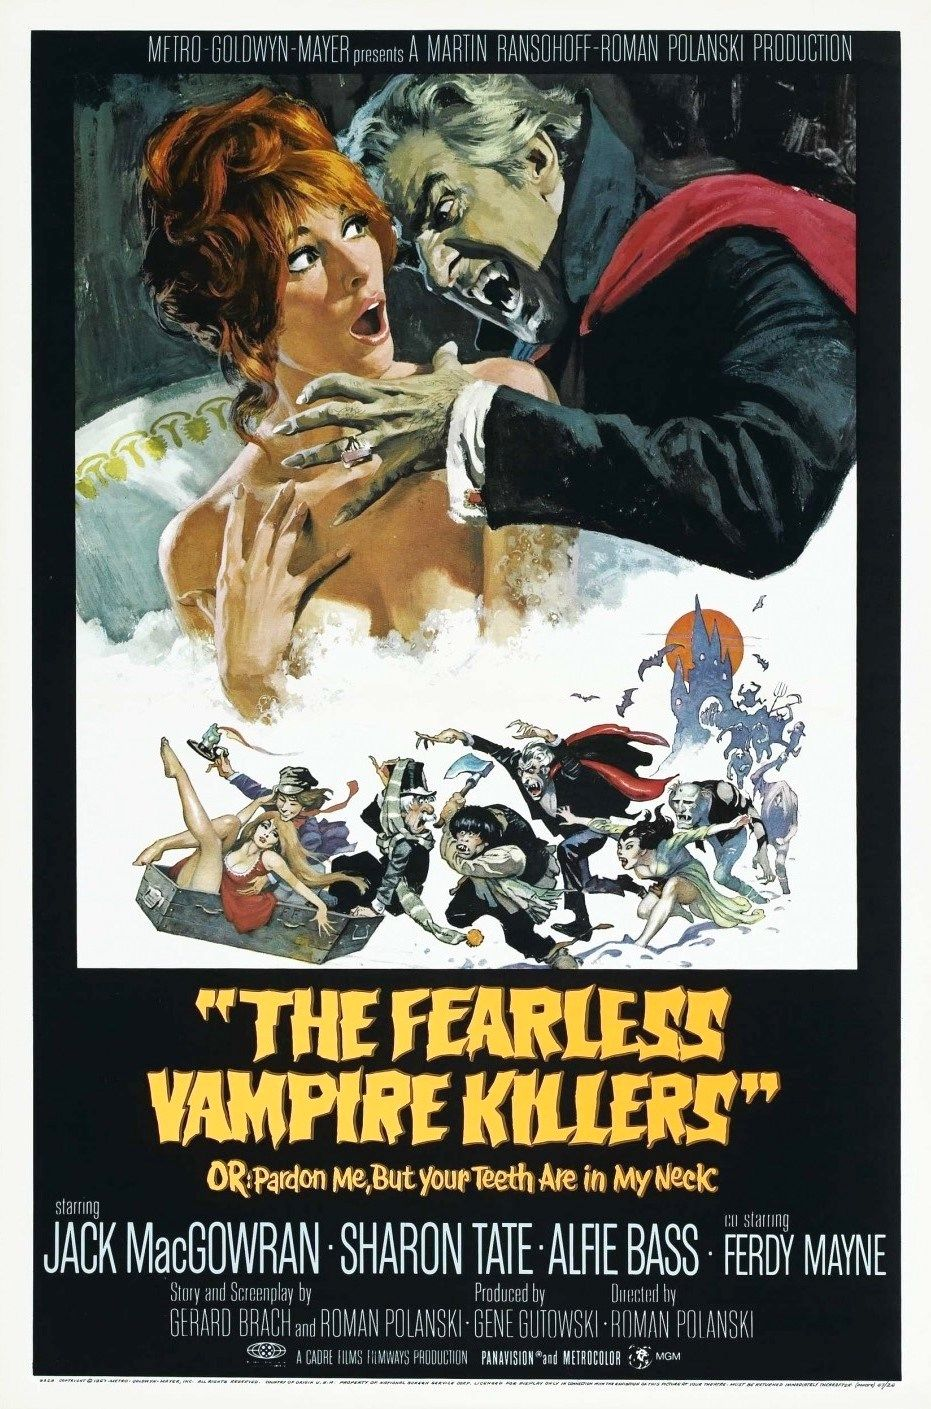 Roman Polanskis The Fearless Vampire Killers | Vampire movies, Horror posters, Movie posters